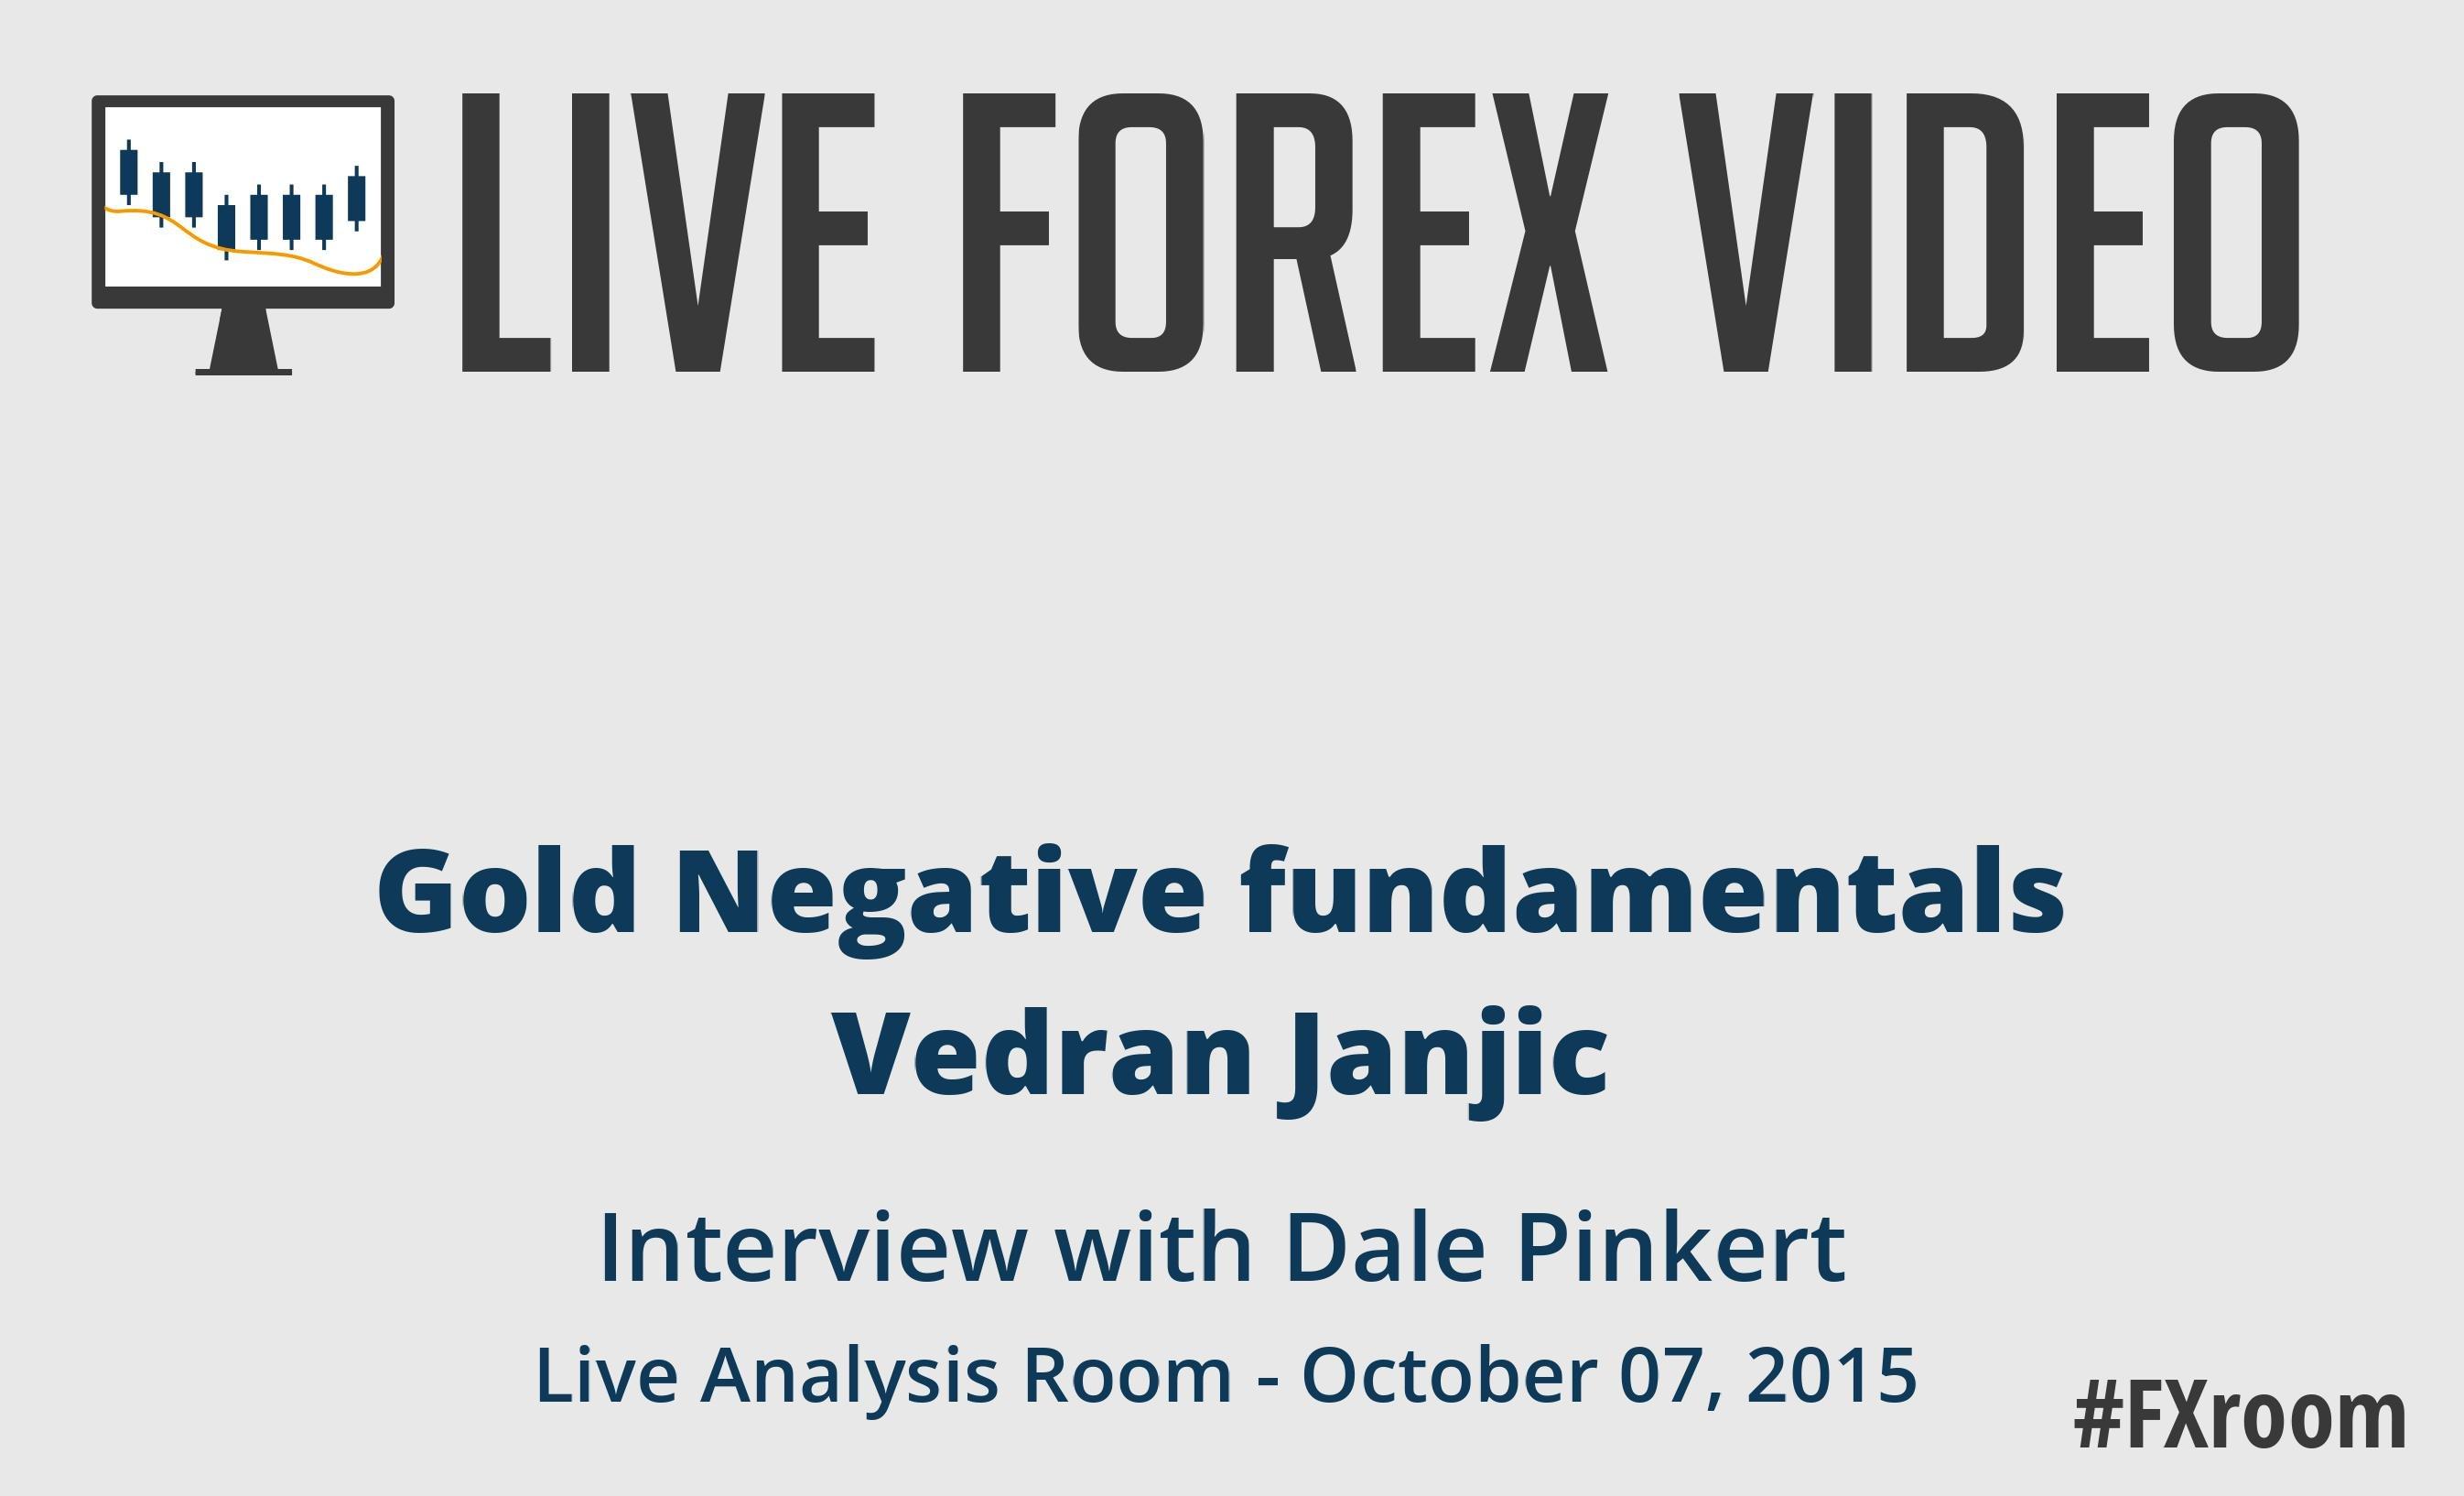 Vedran Janjic: Gold negative fundamentals on Russia and China